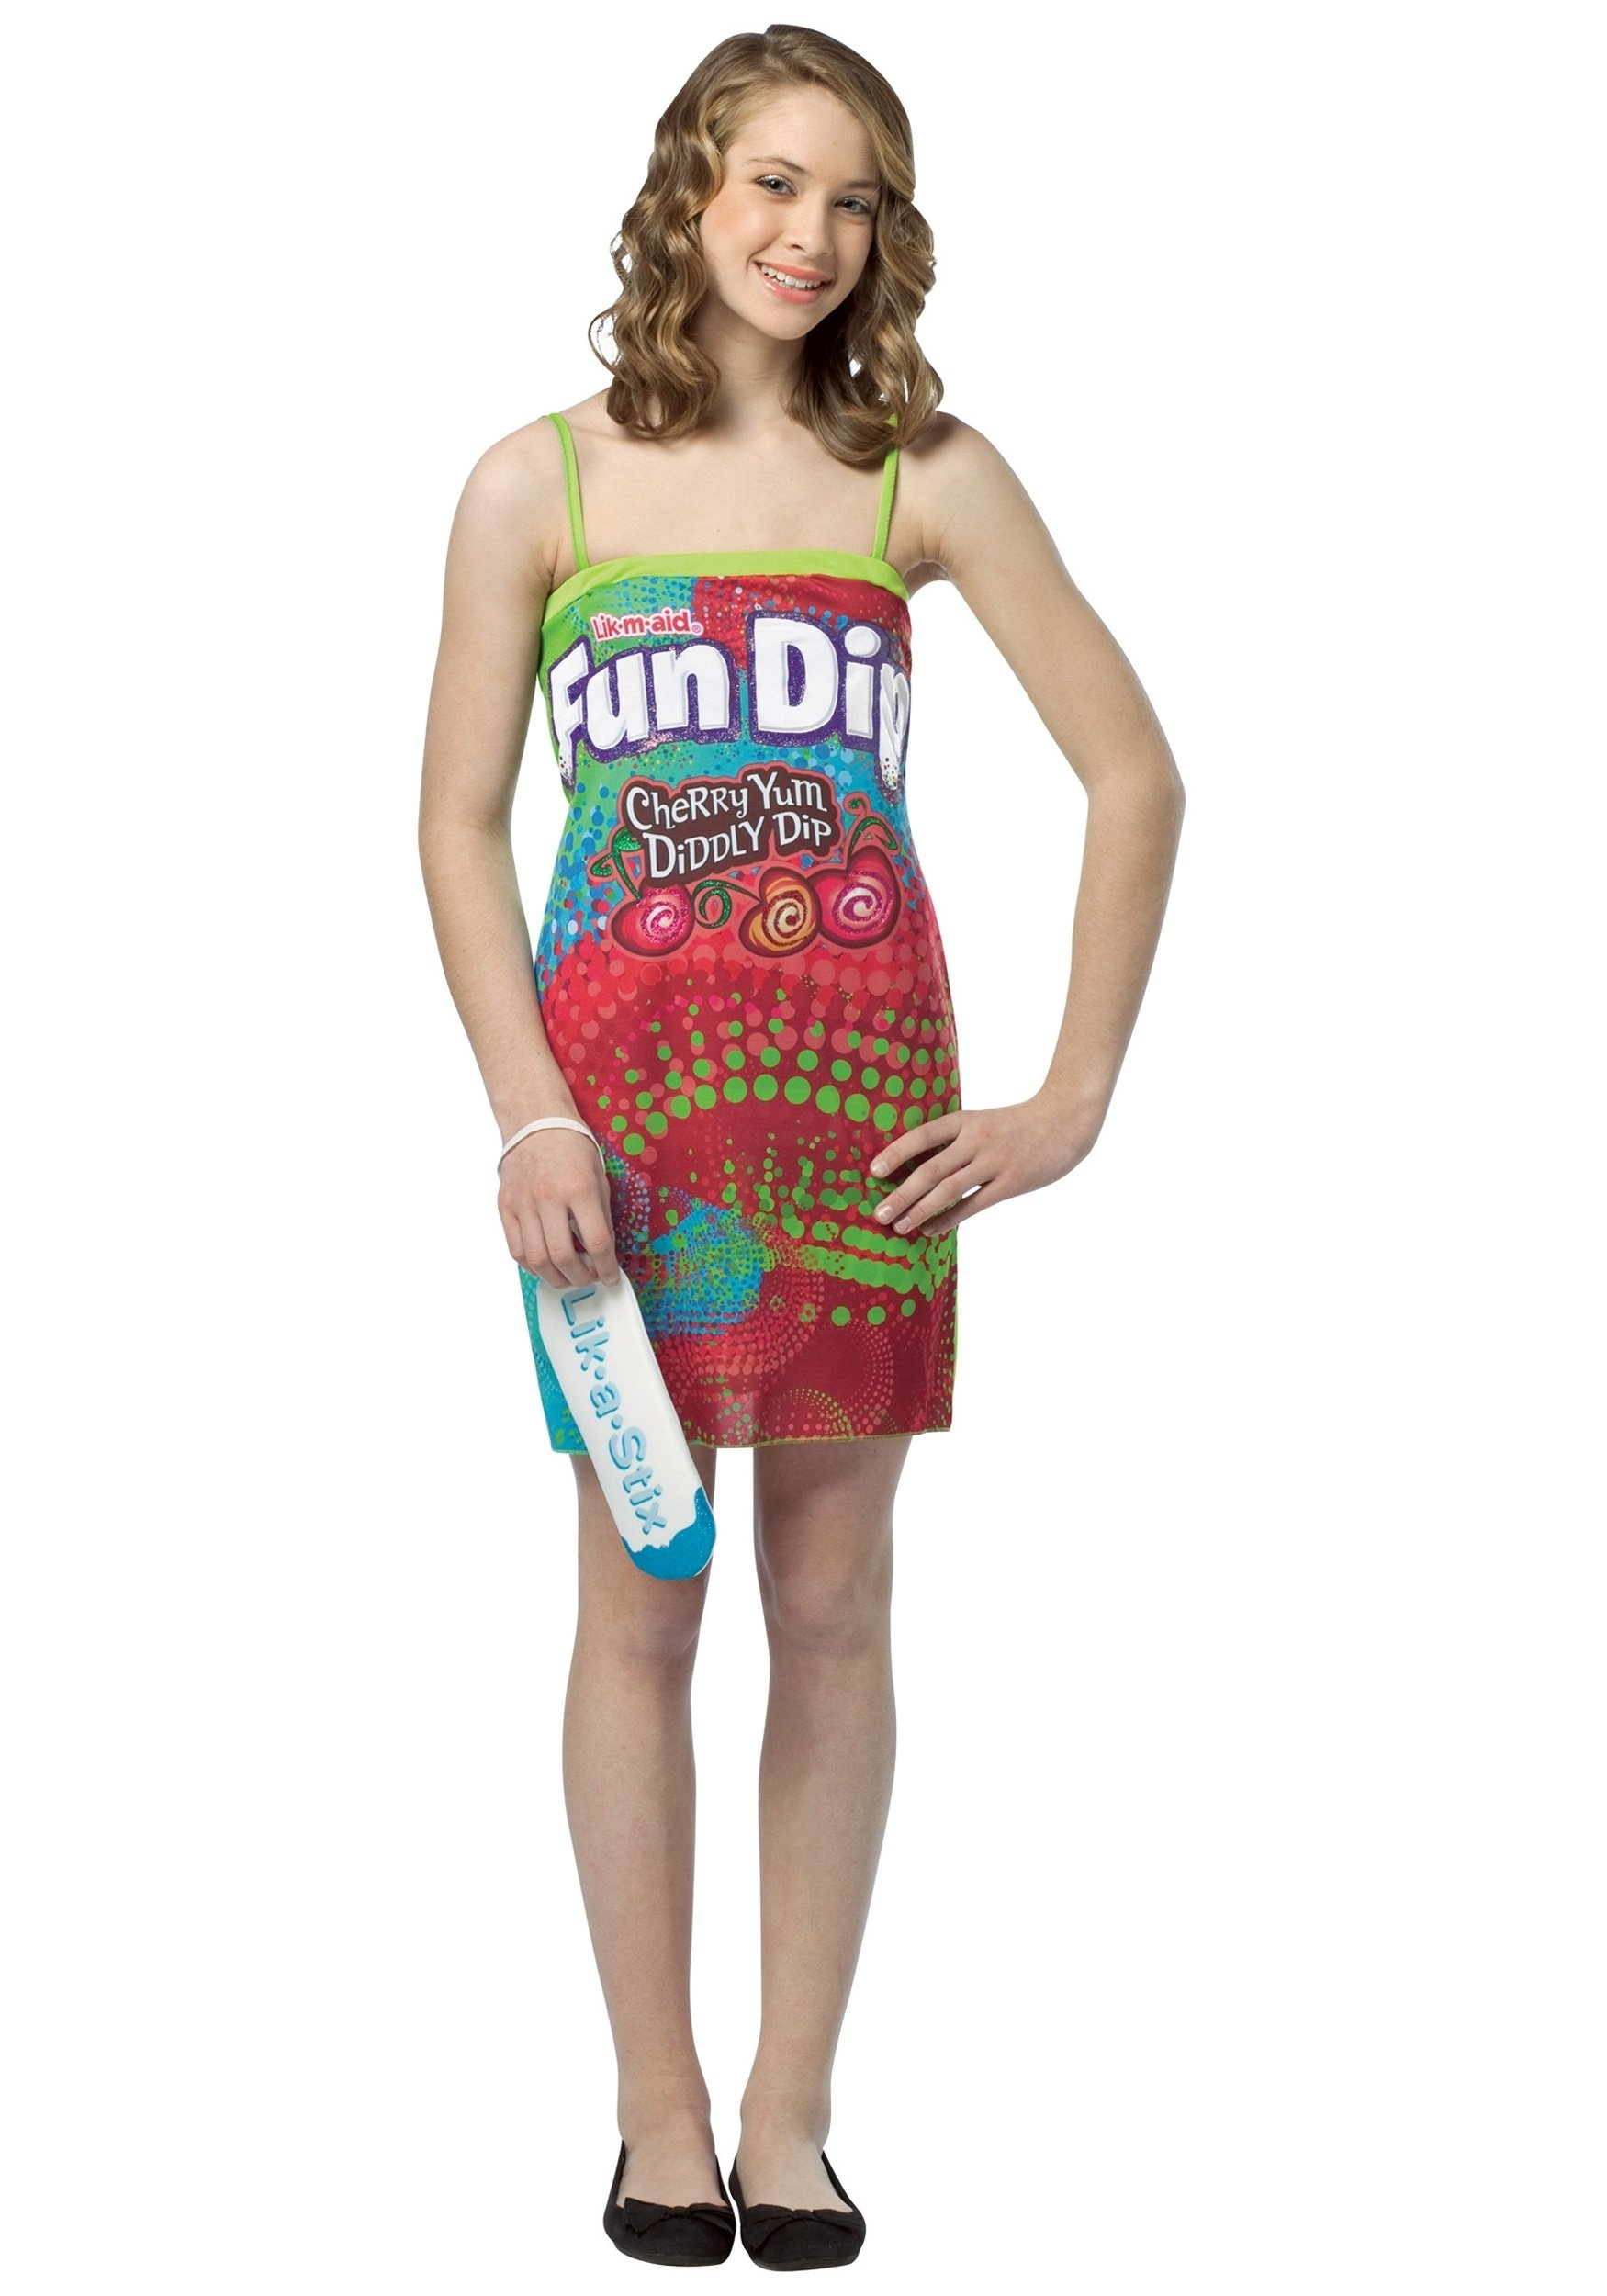 10 Great Teenage Girl Costume Ideas Halloween teen fun dip dress halloween pinterest teen fun fun dip and 6 2020